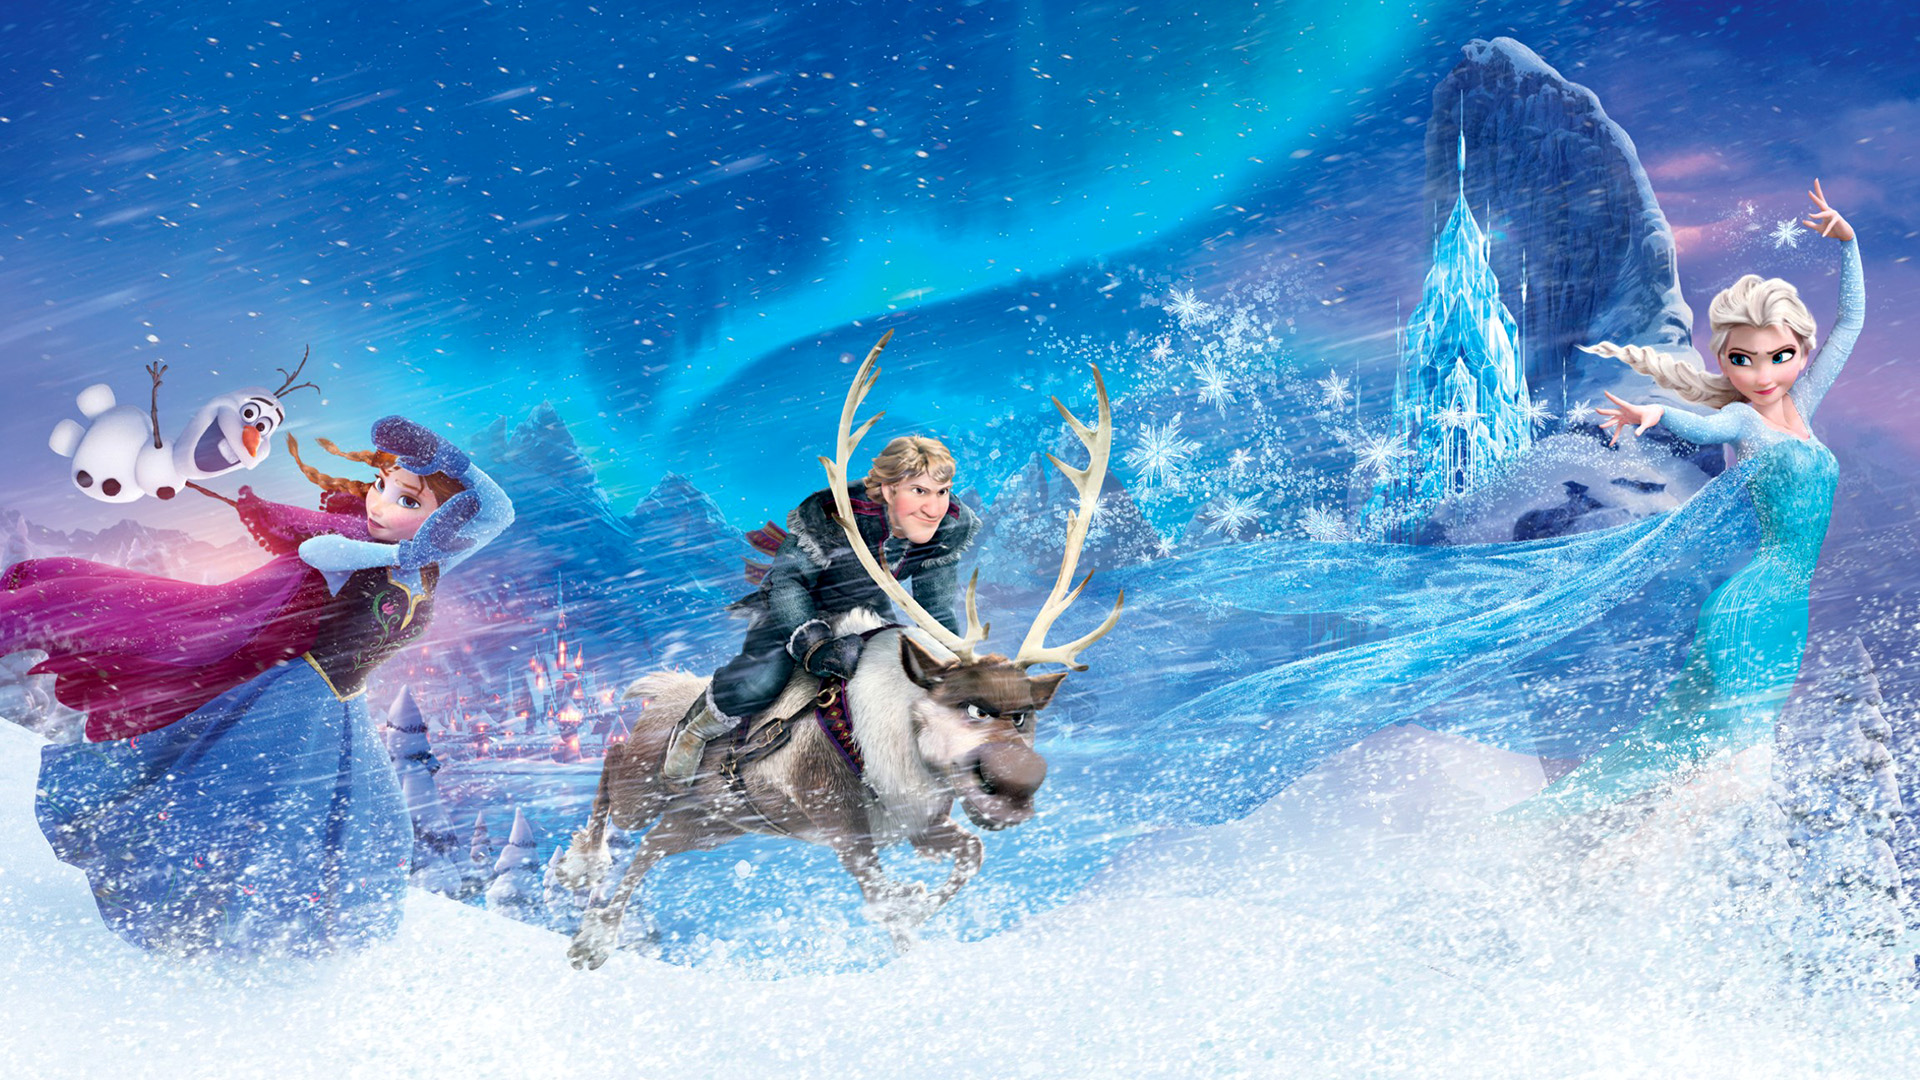 Anna Frozen Elsa Frozen Kristoff Frozen Olaf Frozen Sven Frozen 1920x1080